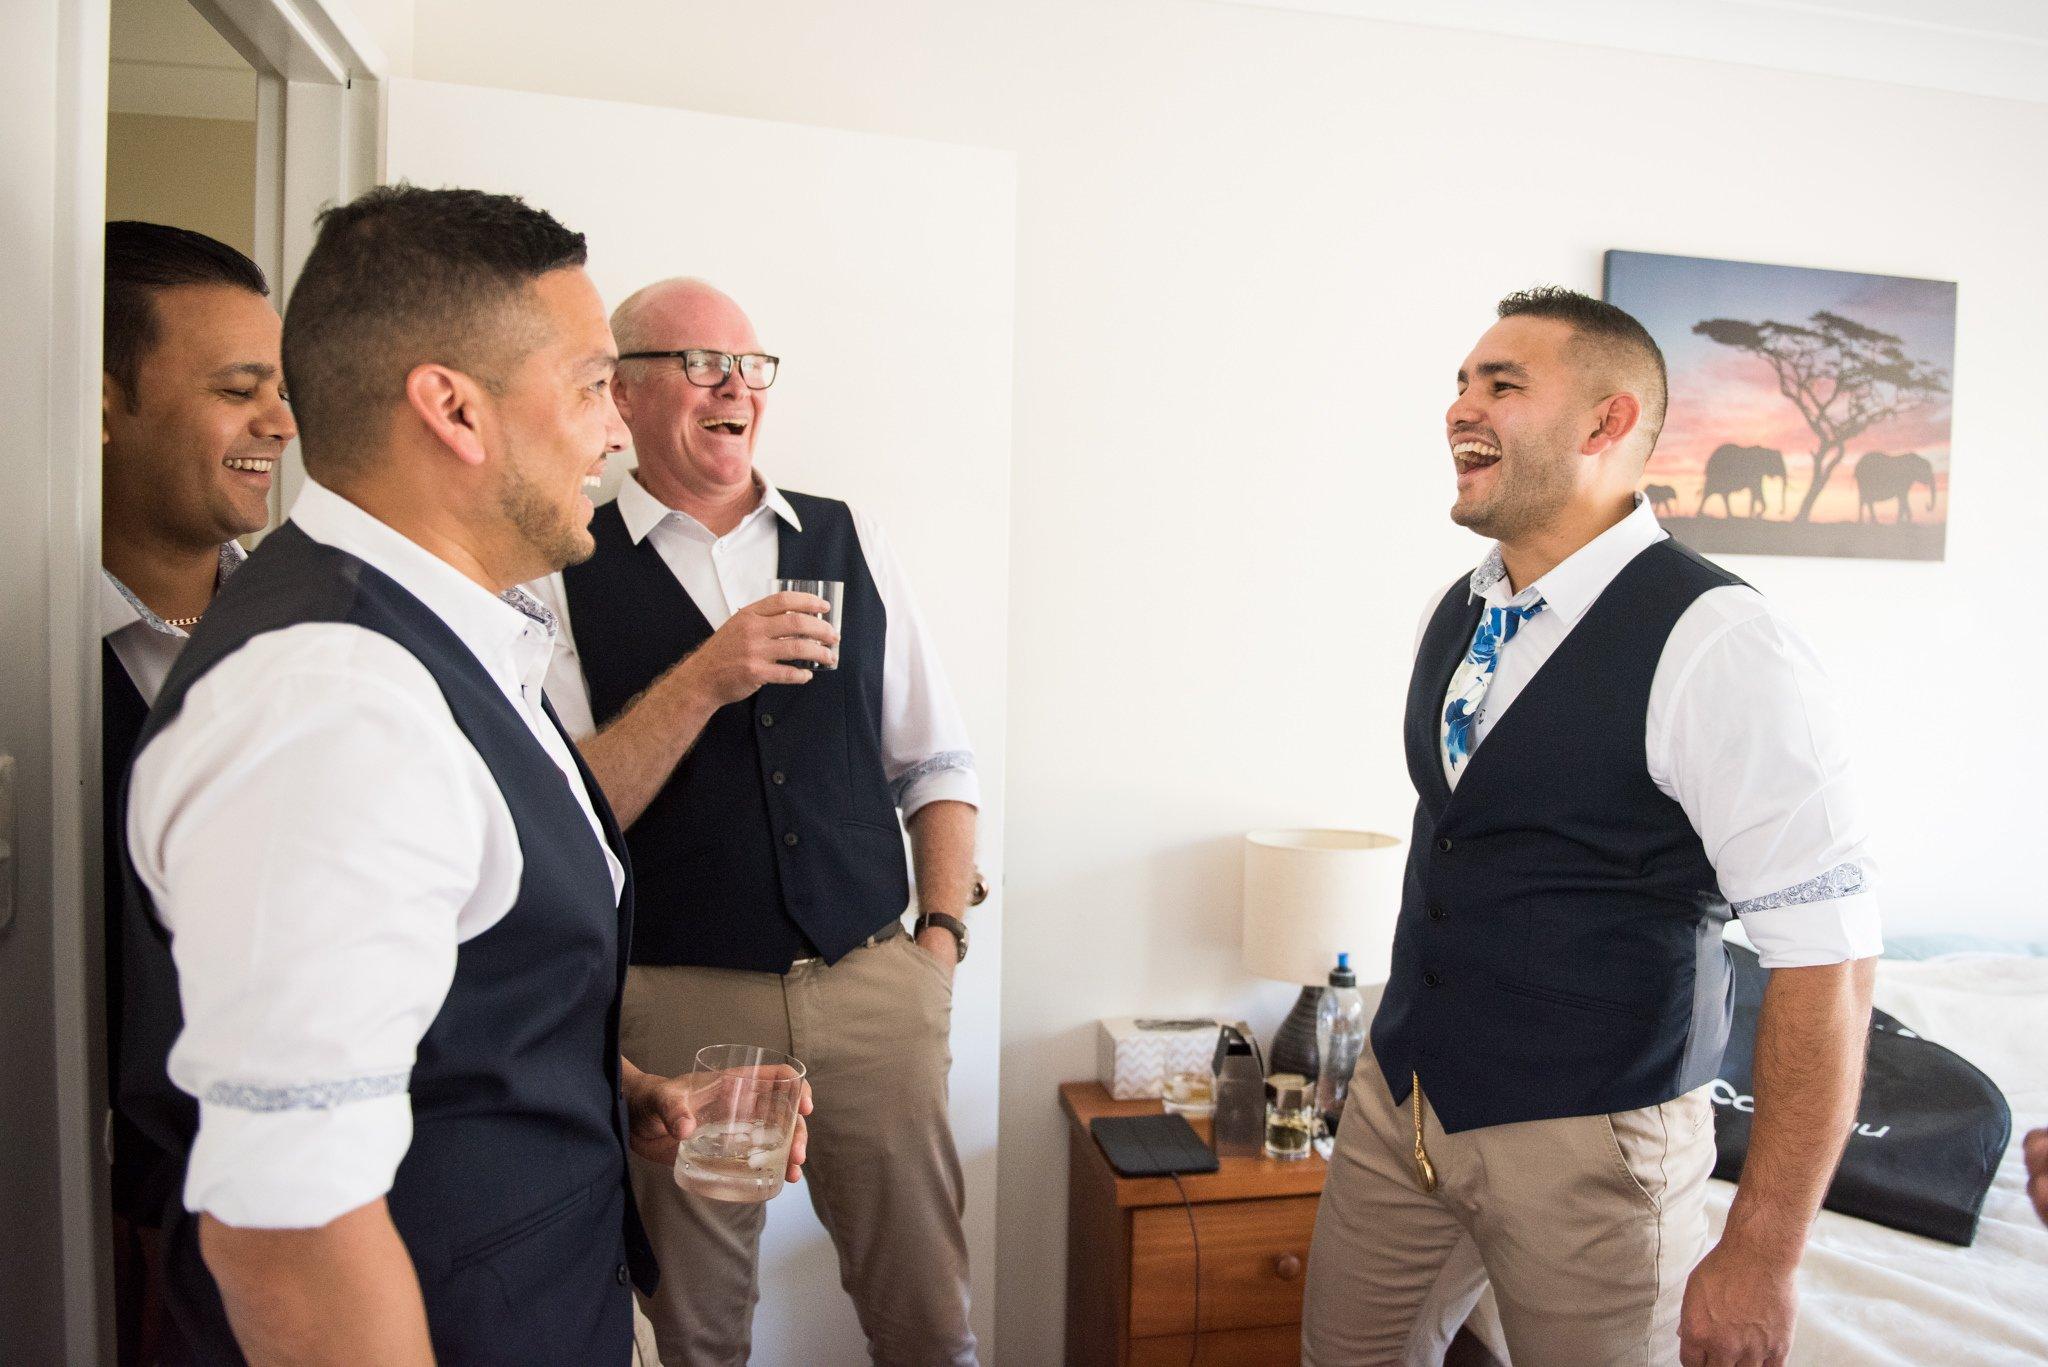 groomsmen getting ready